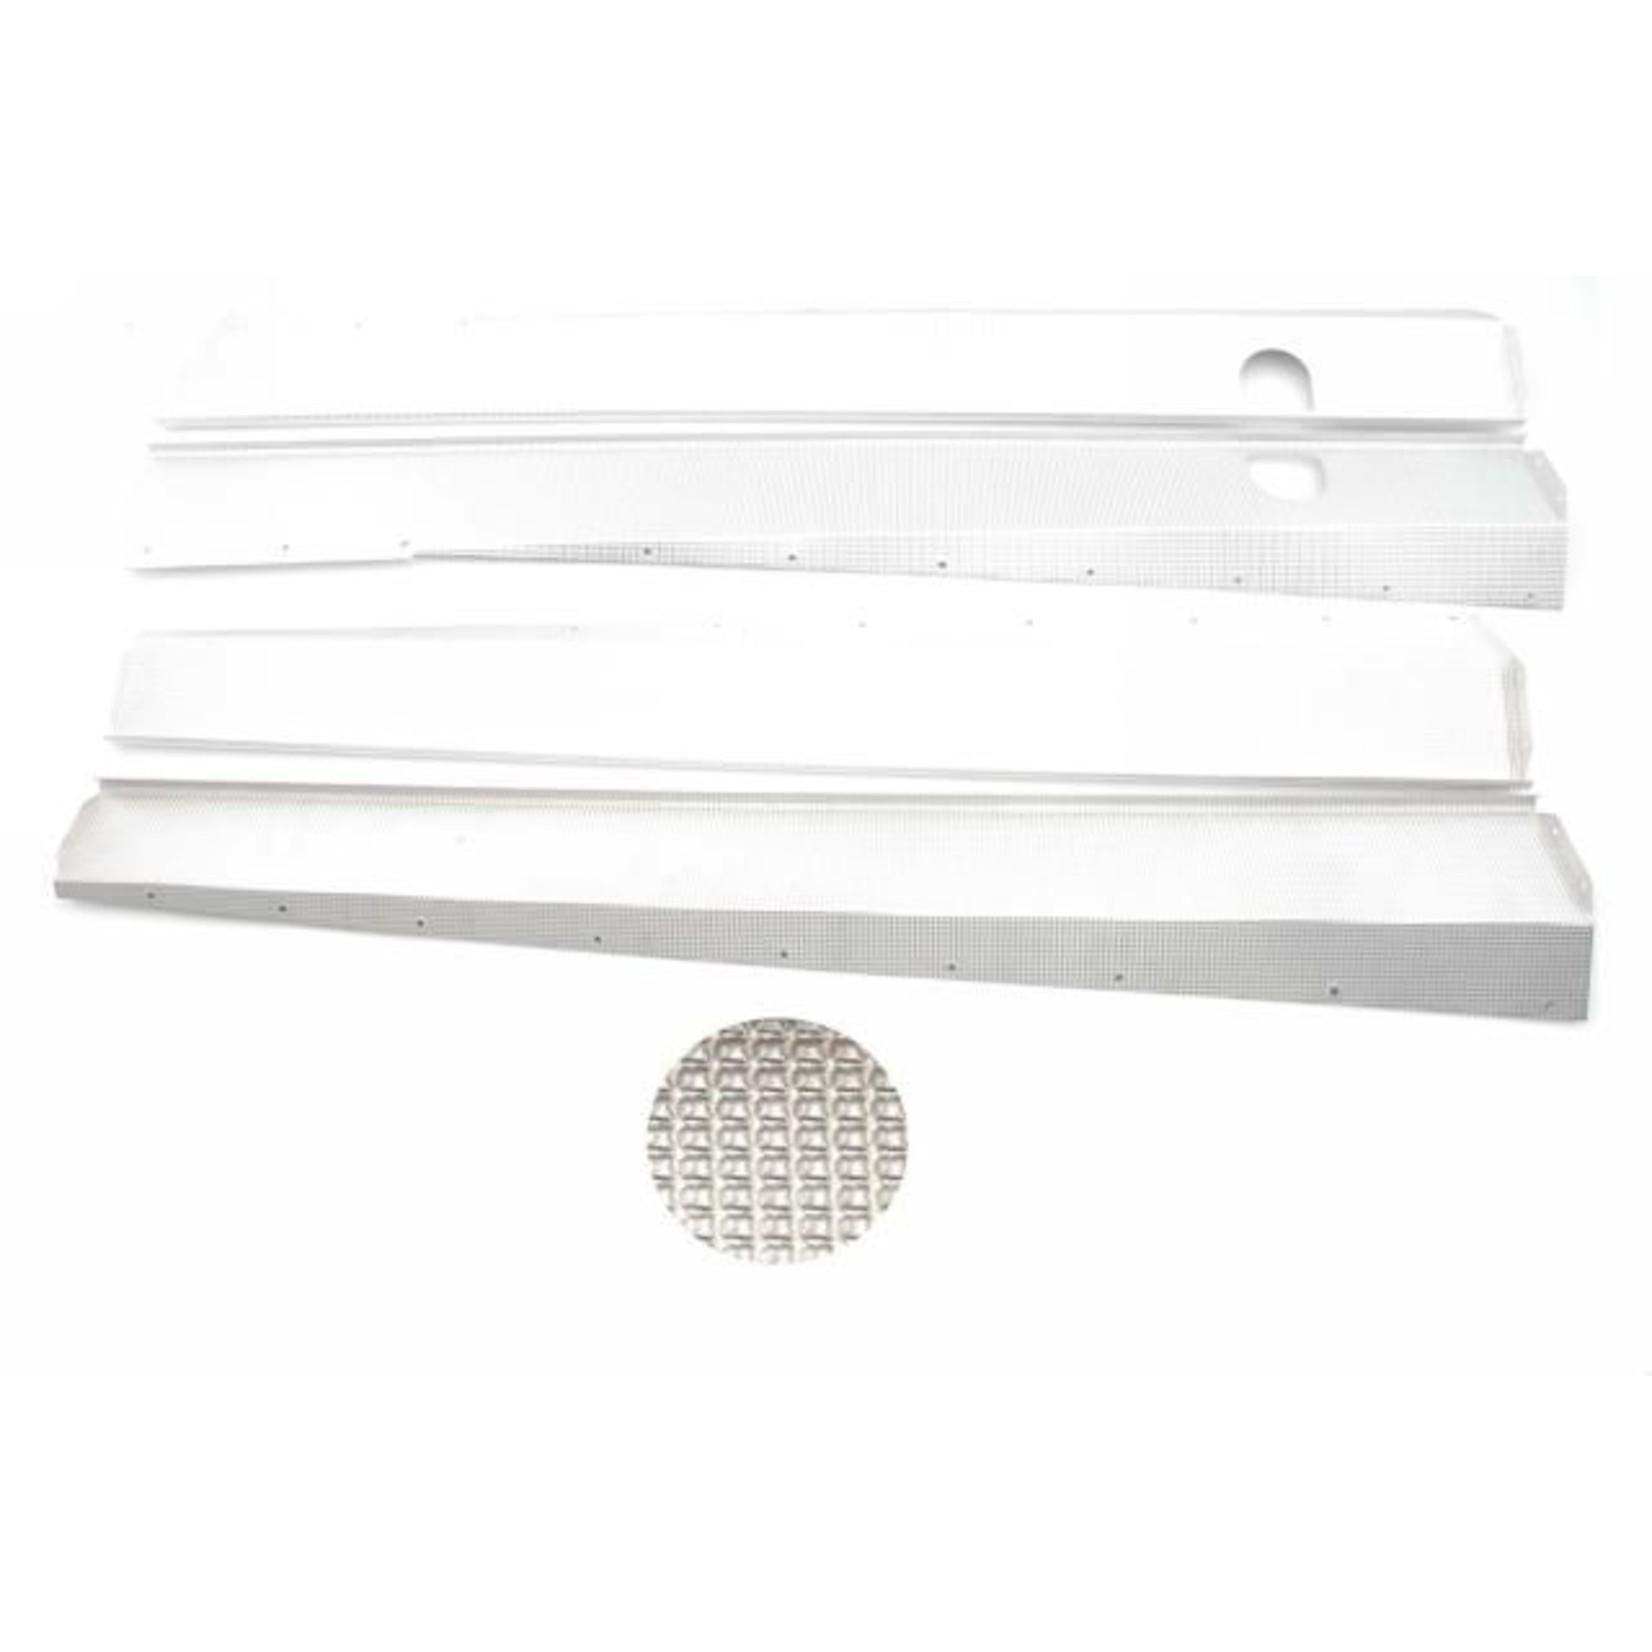 Chapas de caja aluminium Nr Org: DS85362D